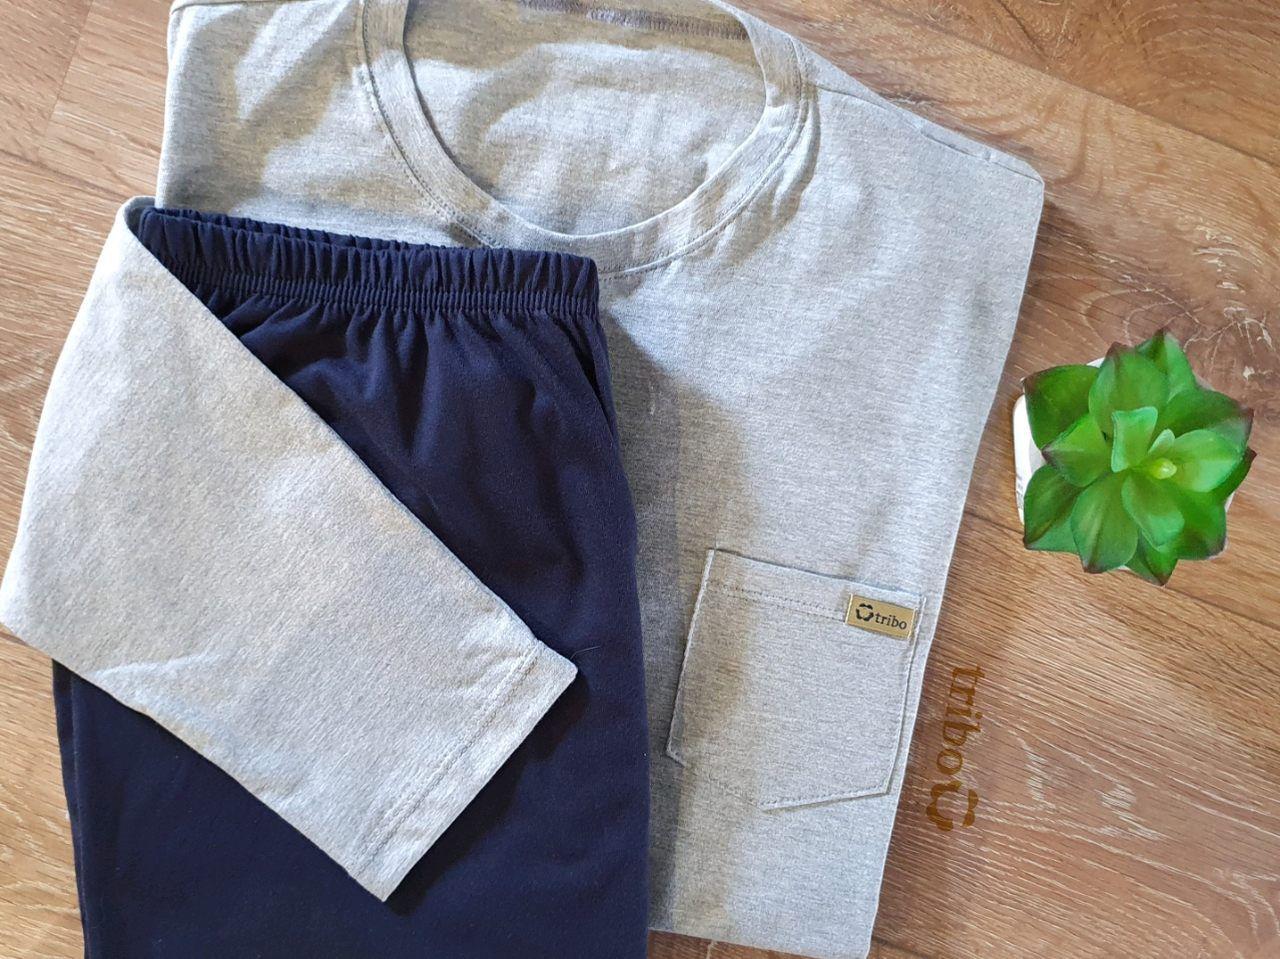 Pijama inverno masculino pai camiseta com bolso calça lisa